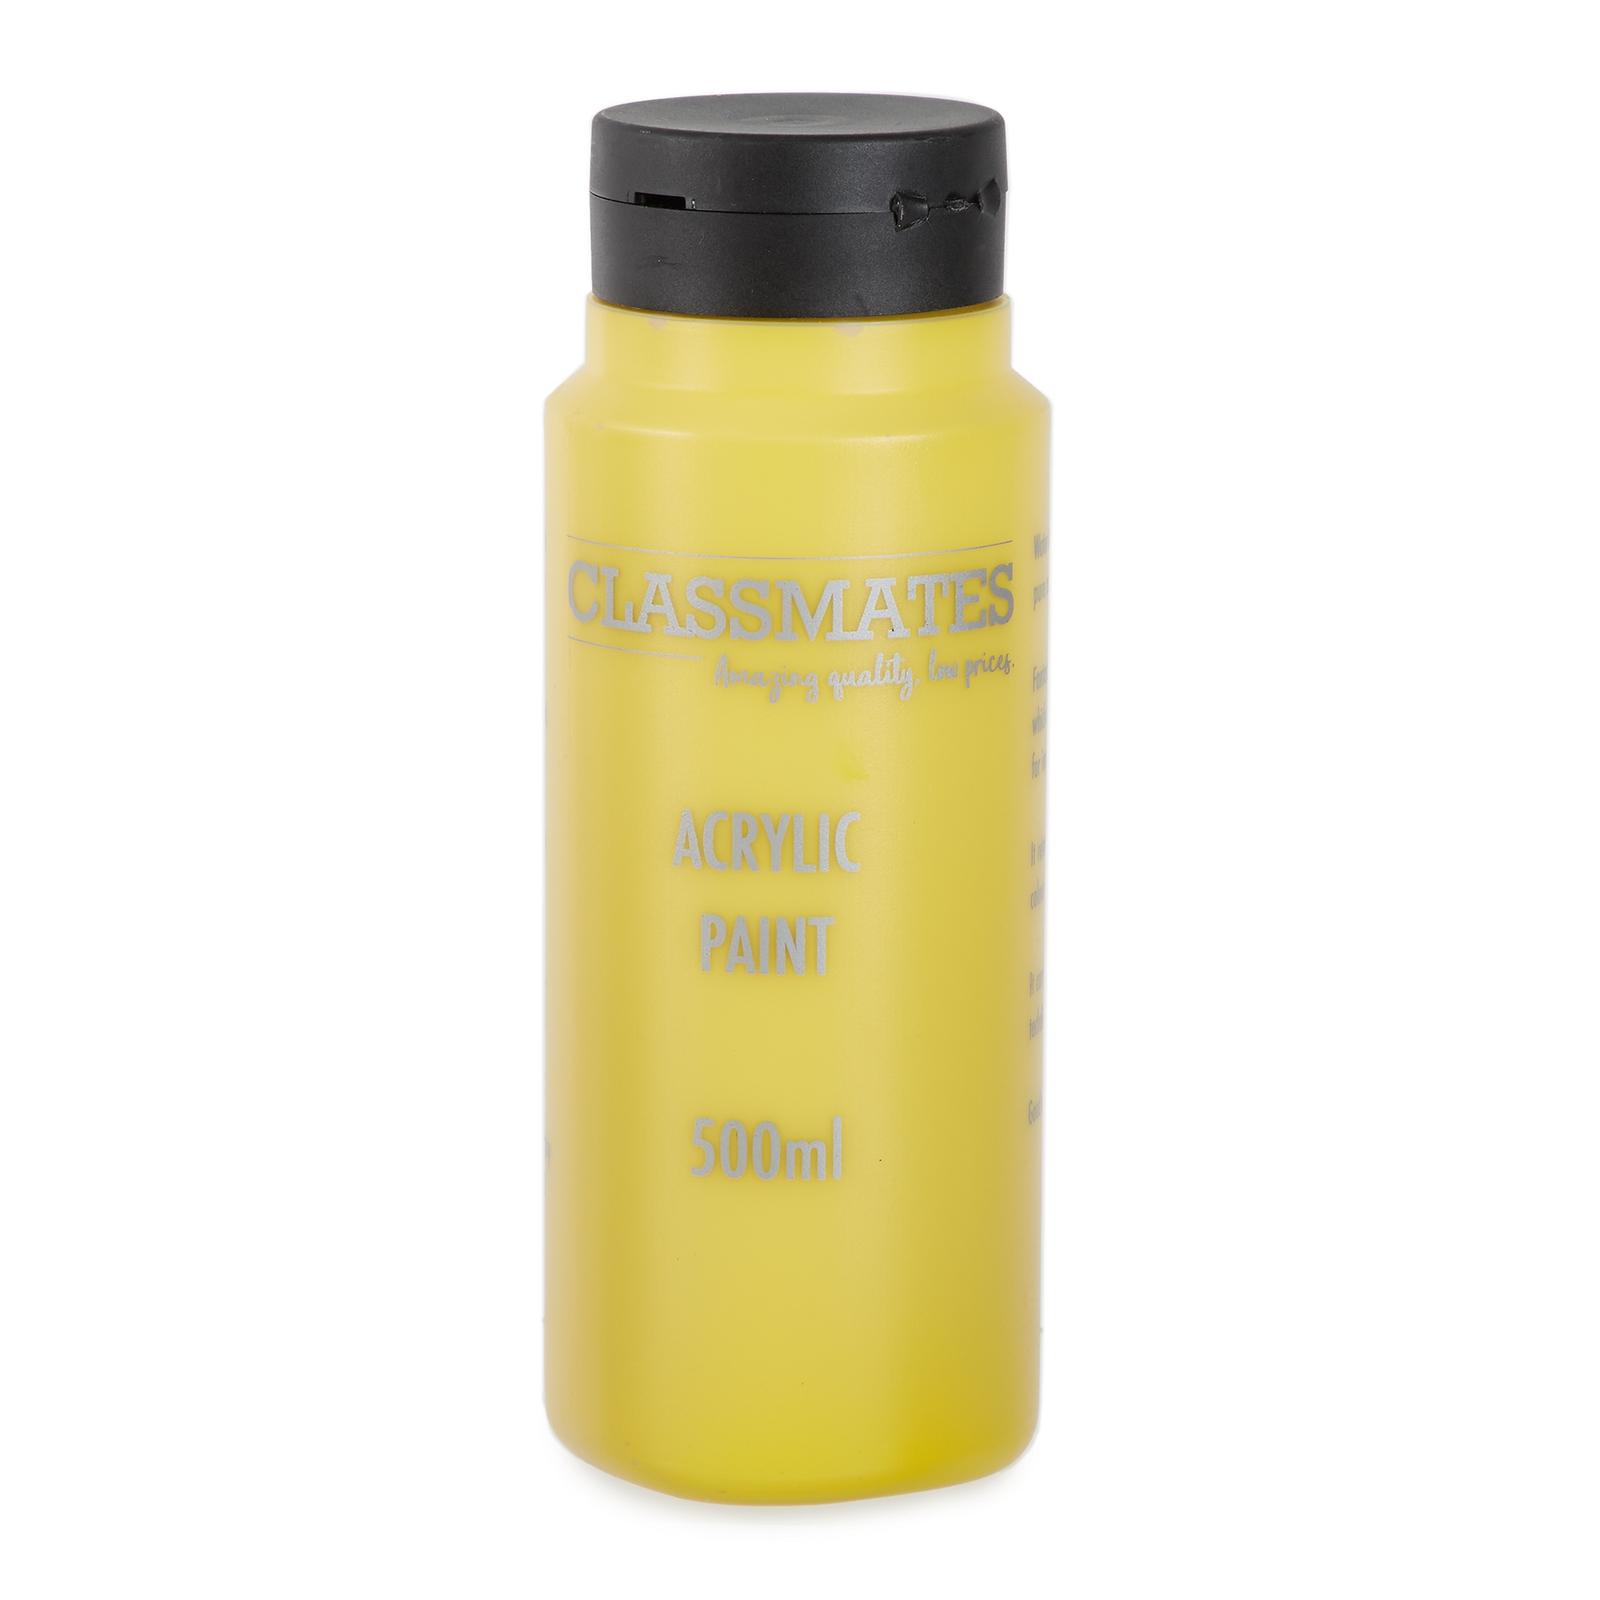 Classmates Acrylic Paint in Mid Yellow - 500ml Bottle